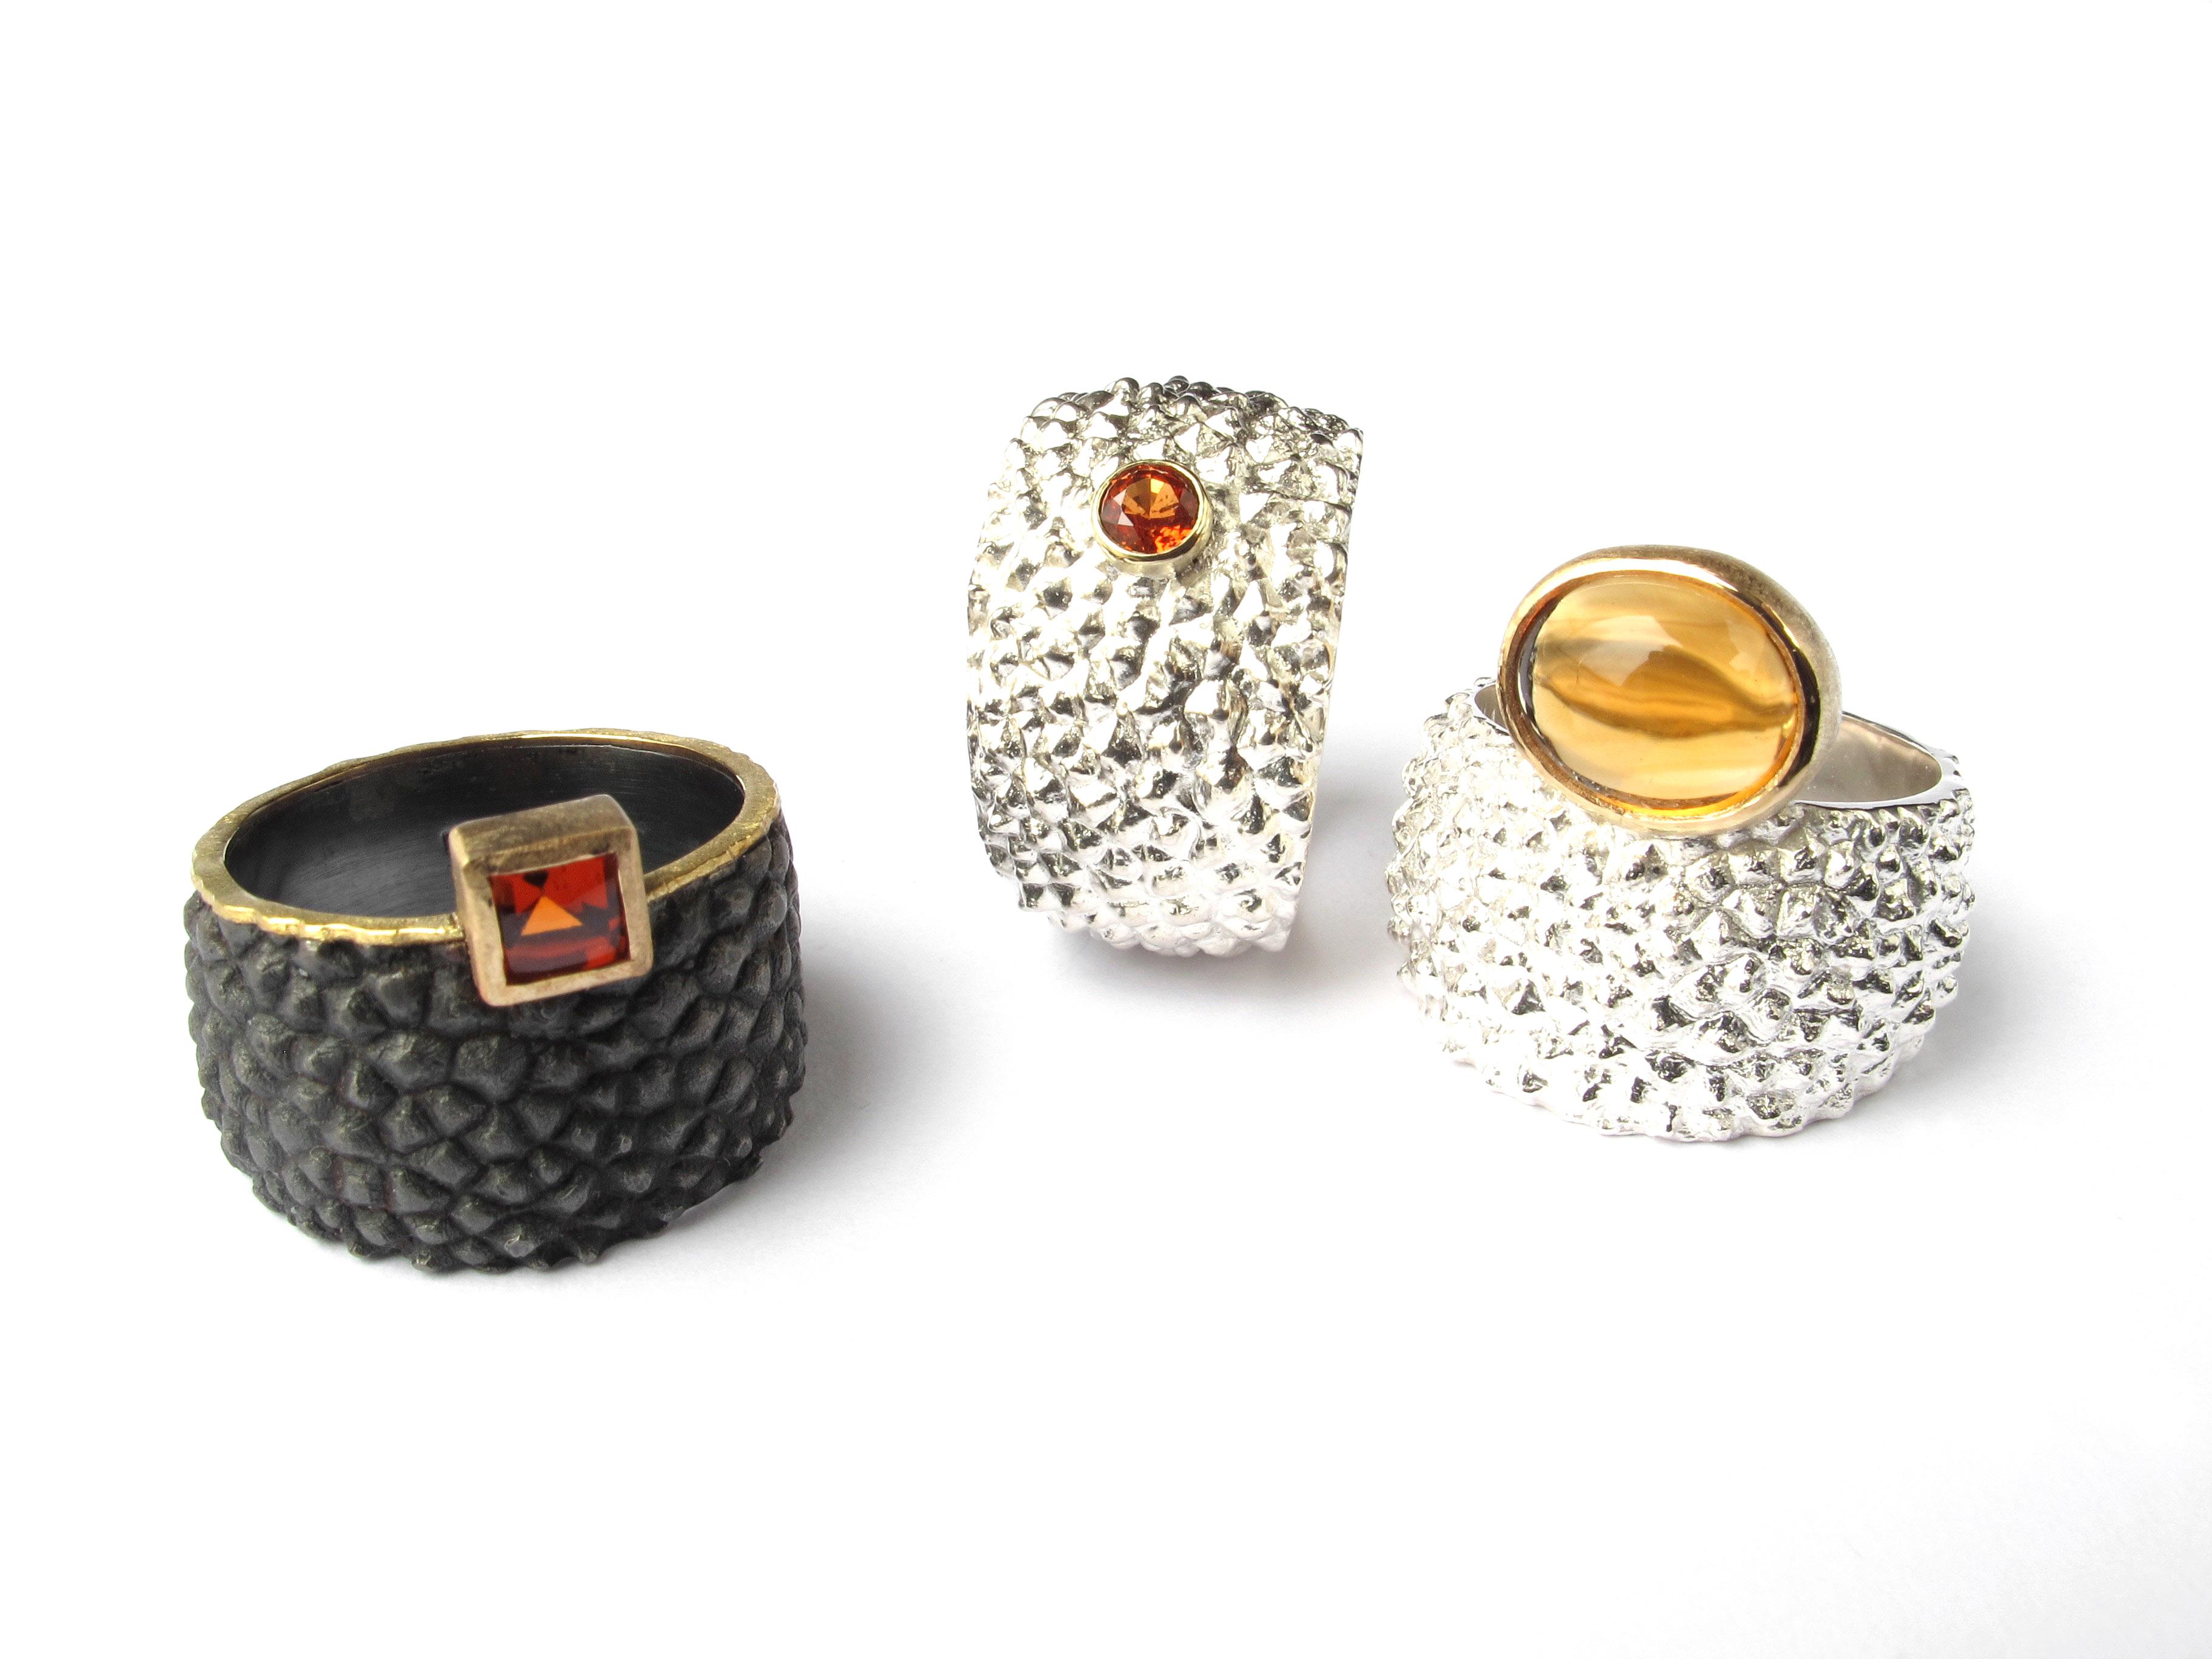 3 rings precious stones